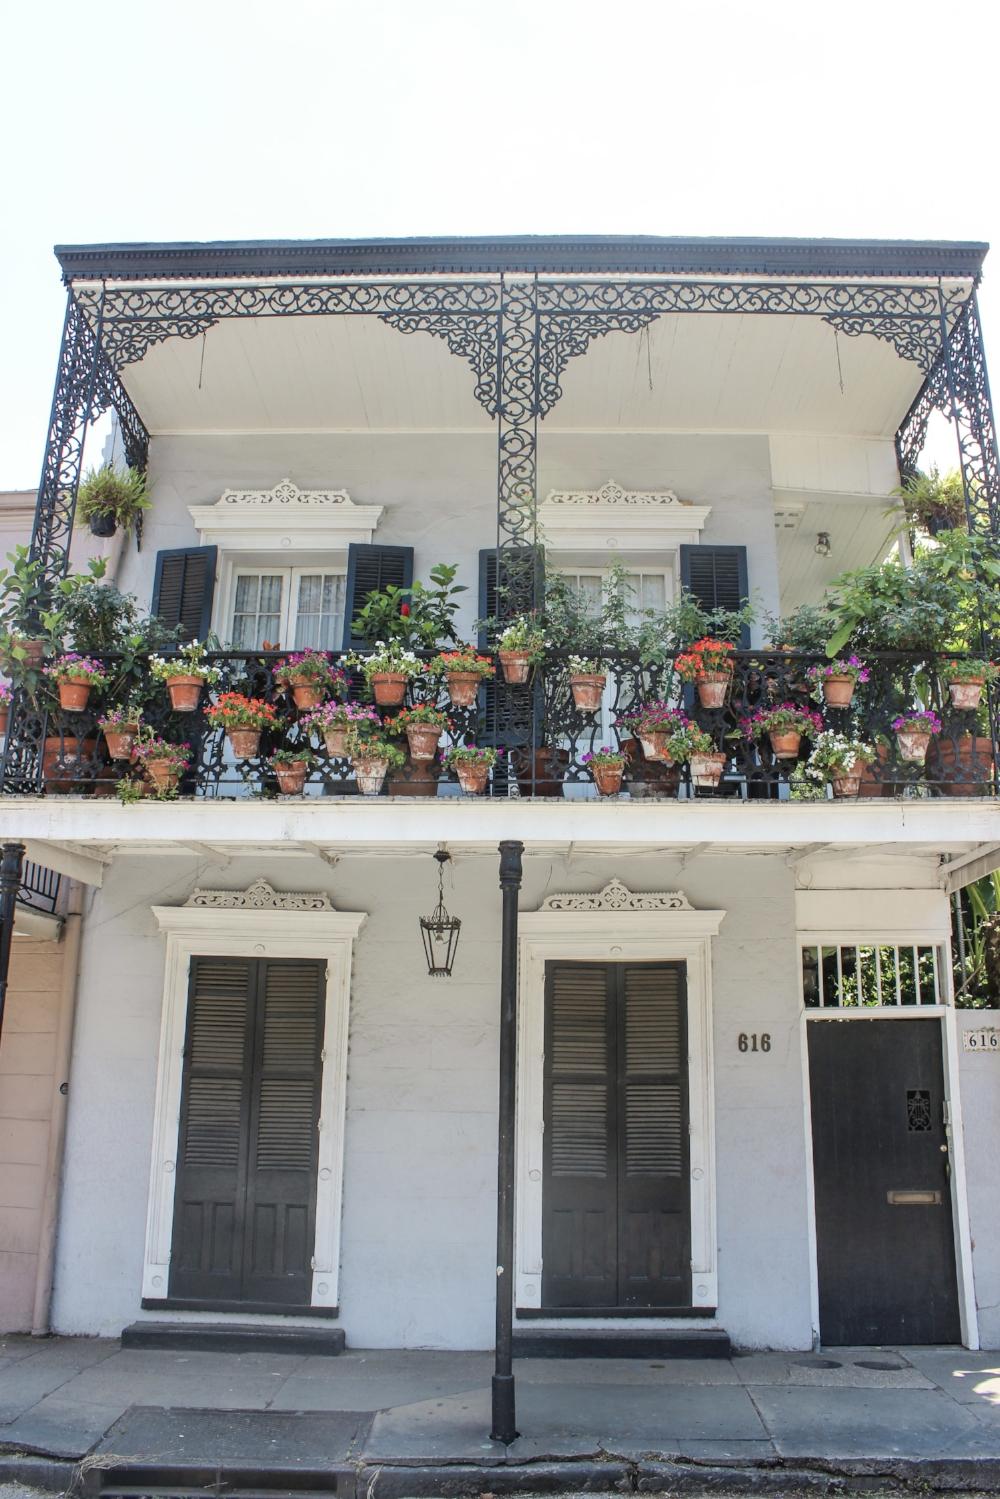 curio.trips.usa.new.orleans.white.house.balcony.jpg